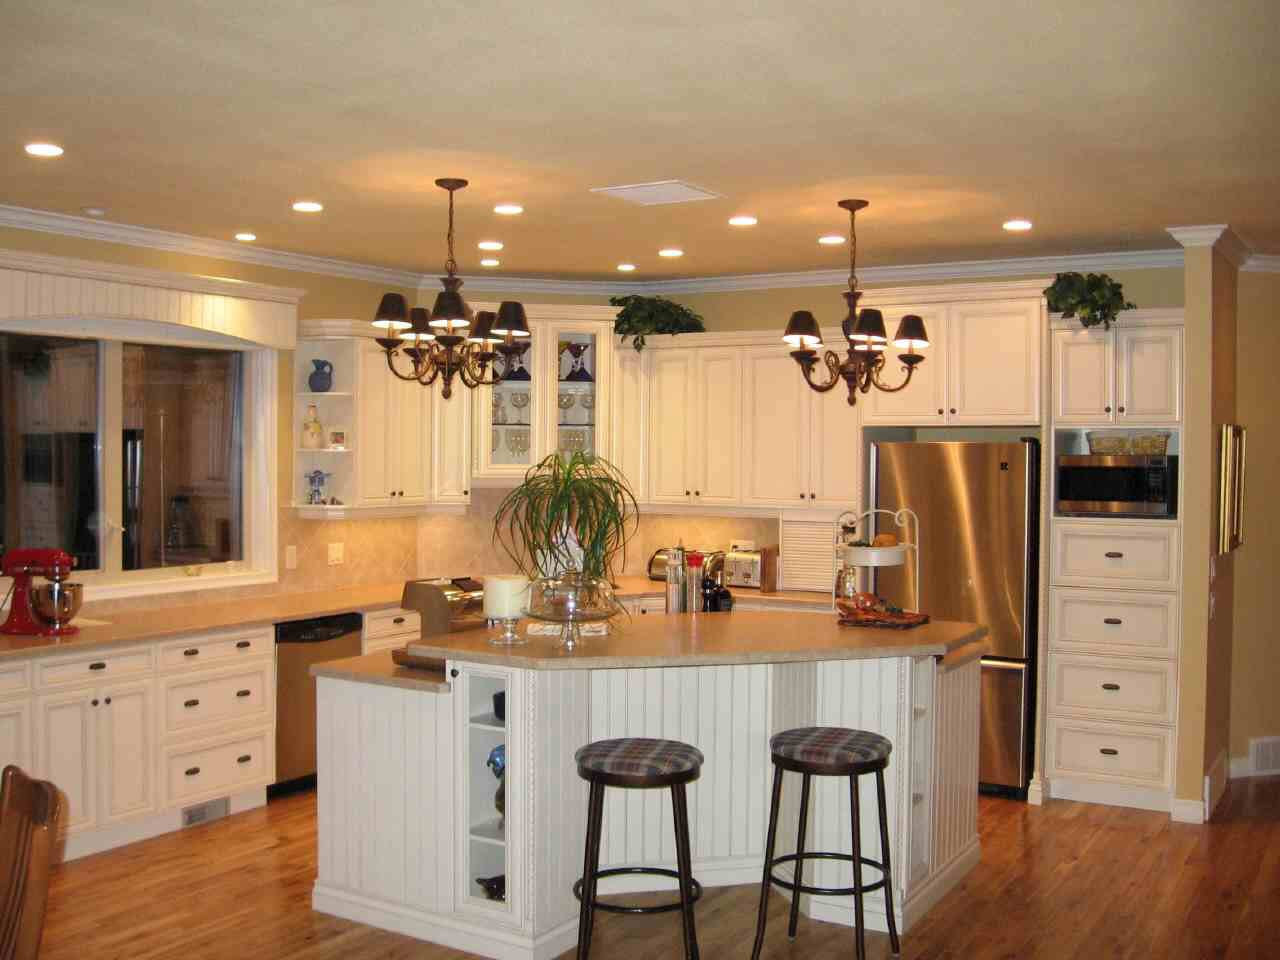 Remarkable White Kitchen Design Ideas 1280 x 960 · 109 kB · jpeg